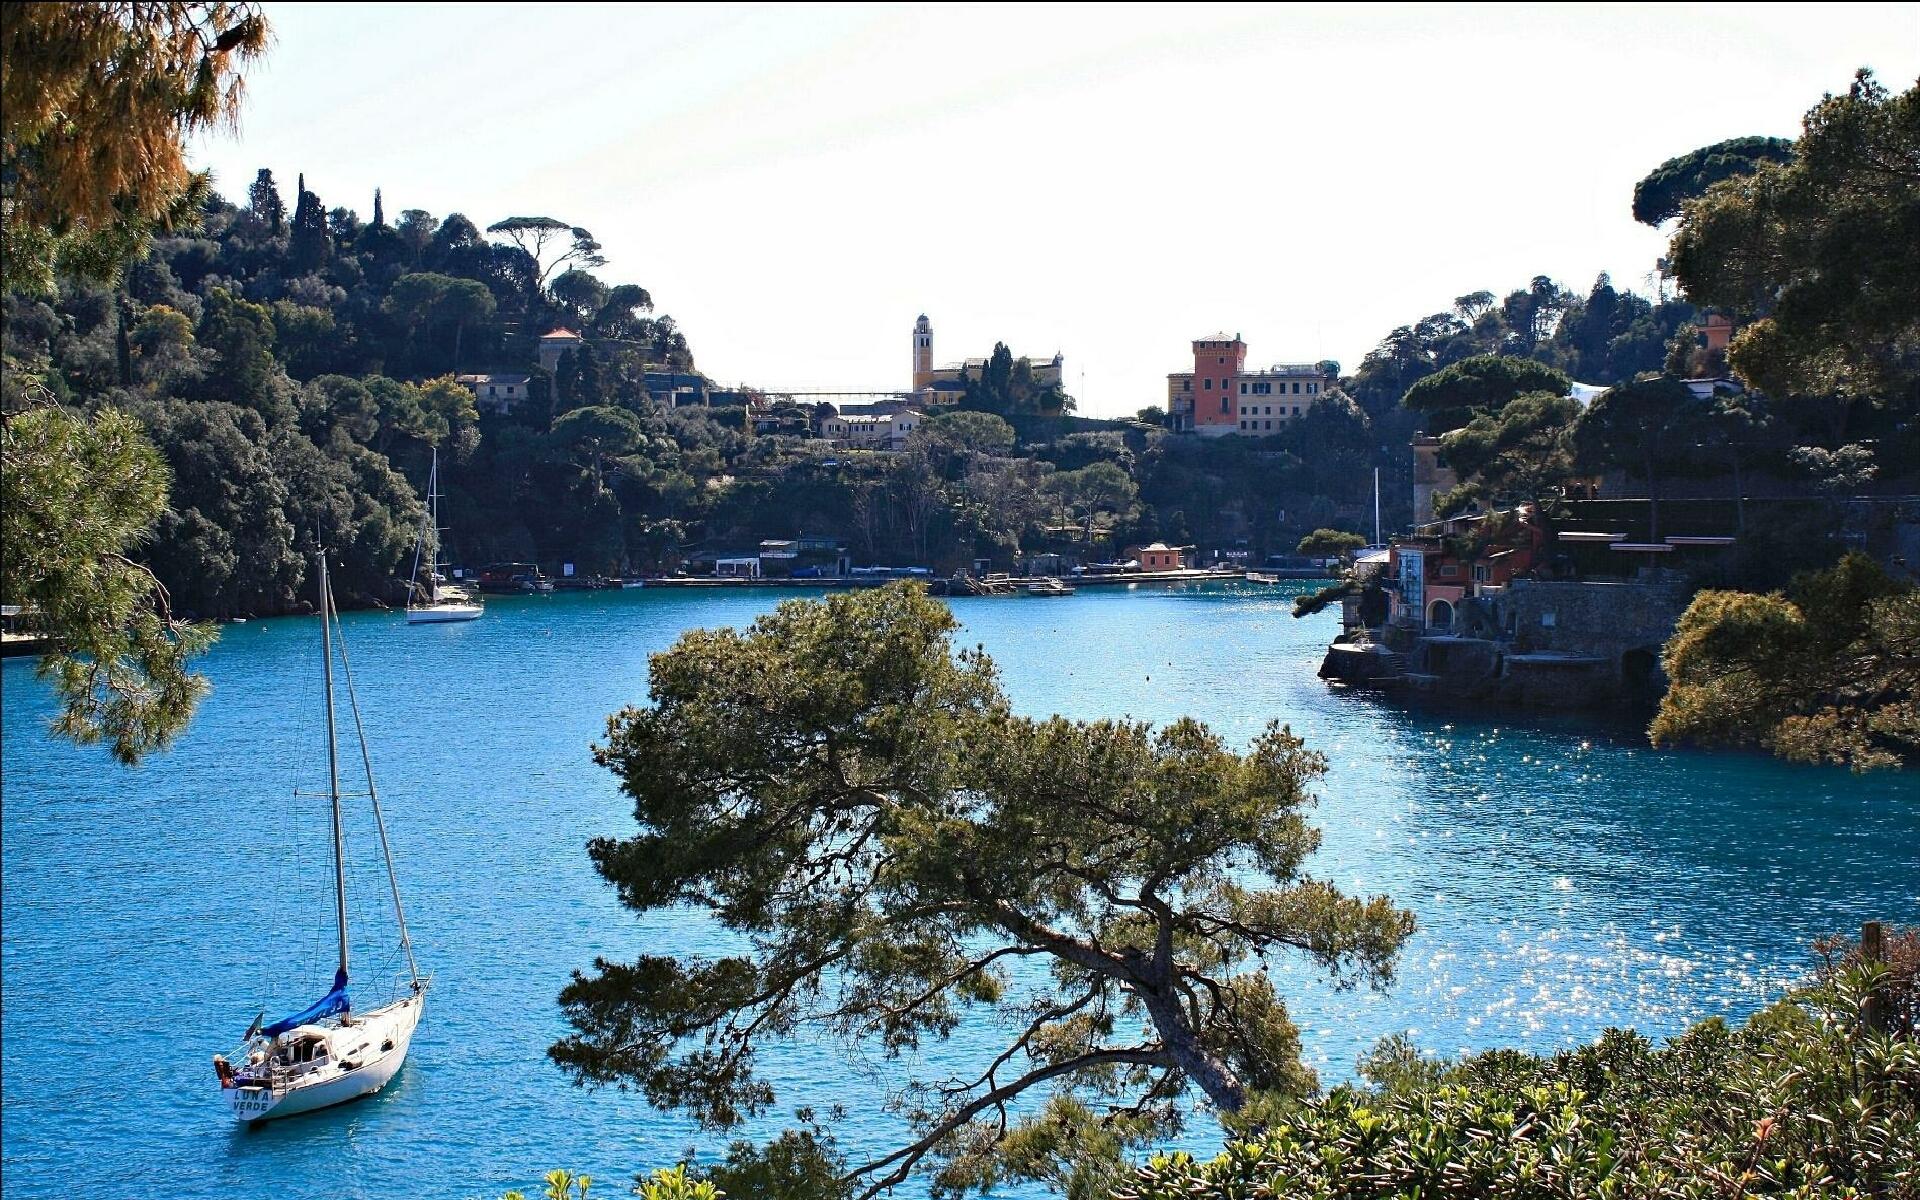 Free Download Portofino Fishing Village Wallpaper Hd Hd